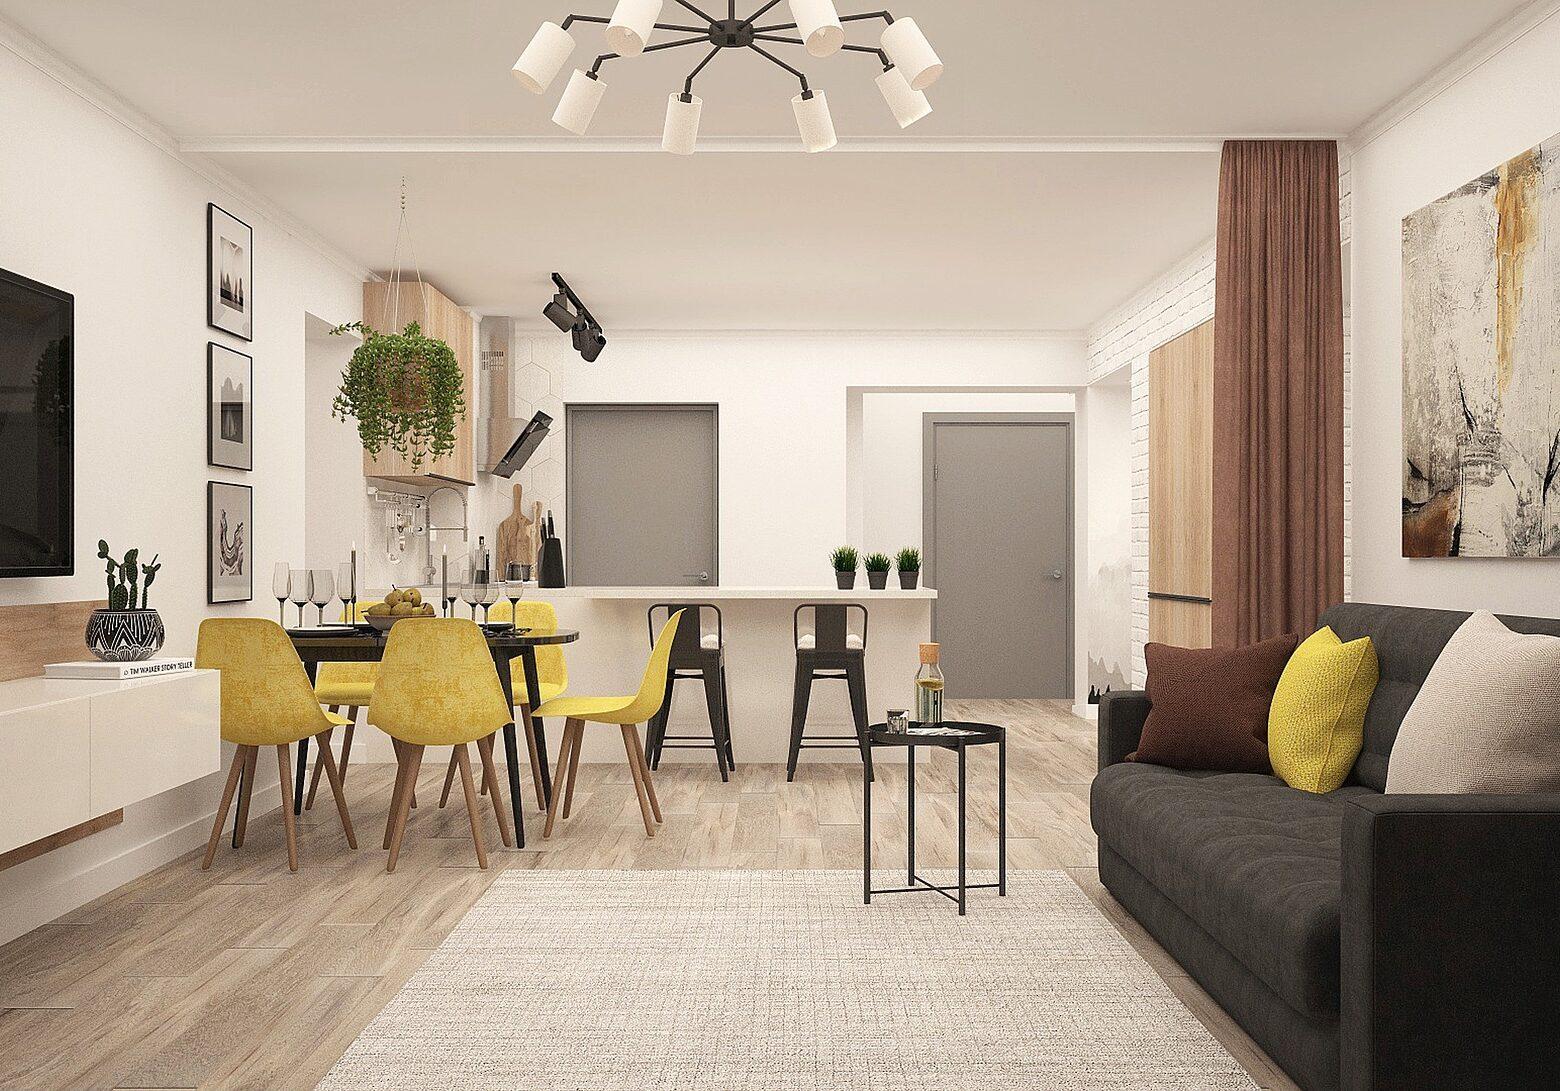 hshc-spring-2021-kitchen-living-room-4043091_1920